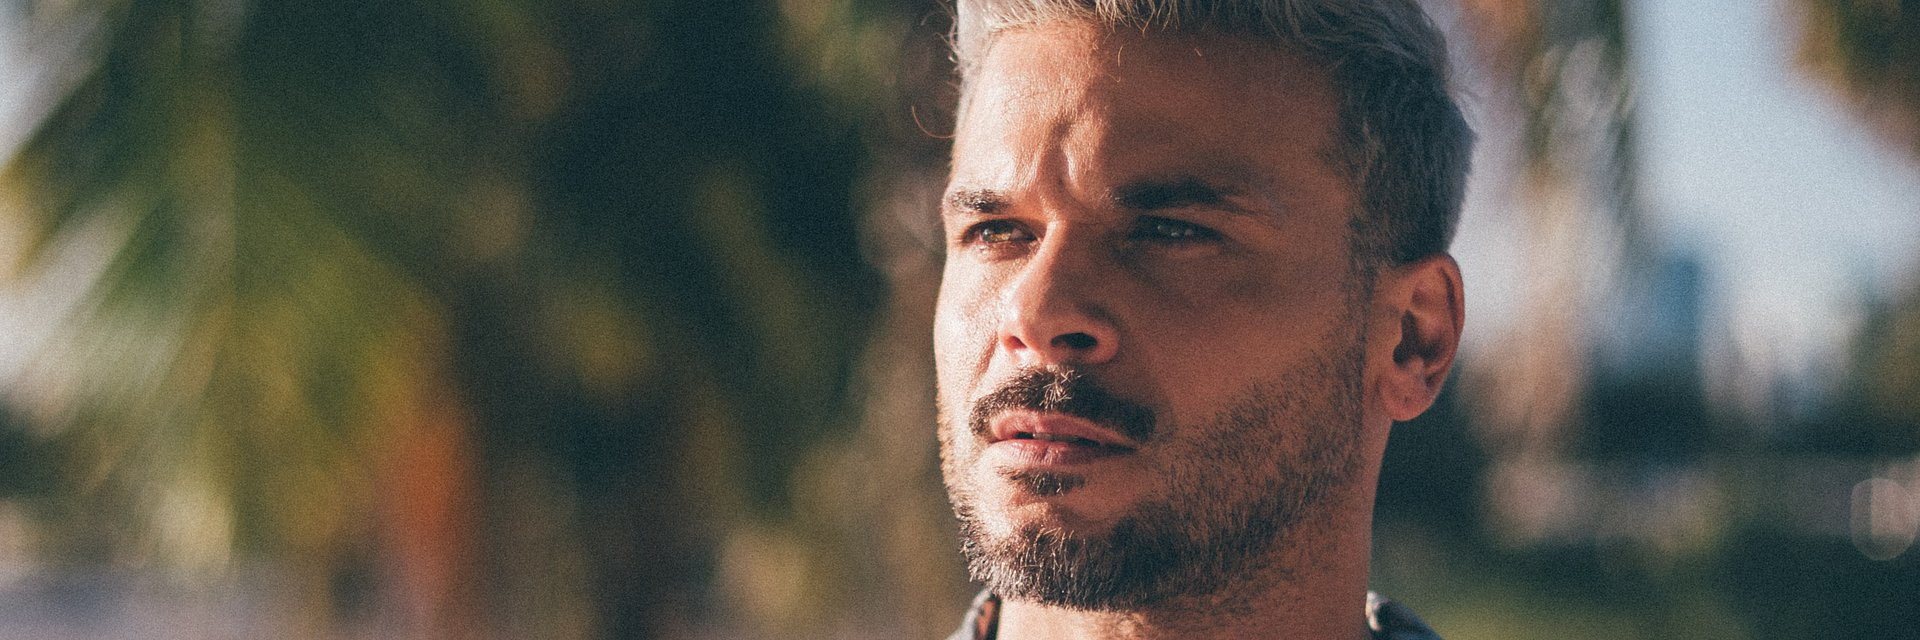 "Pedro Capó, twórca hitu ""Calma"" wraca z nowym singlem!"